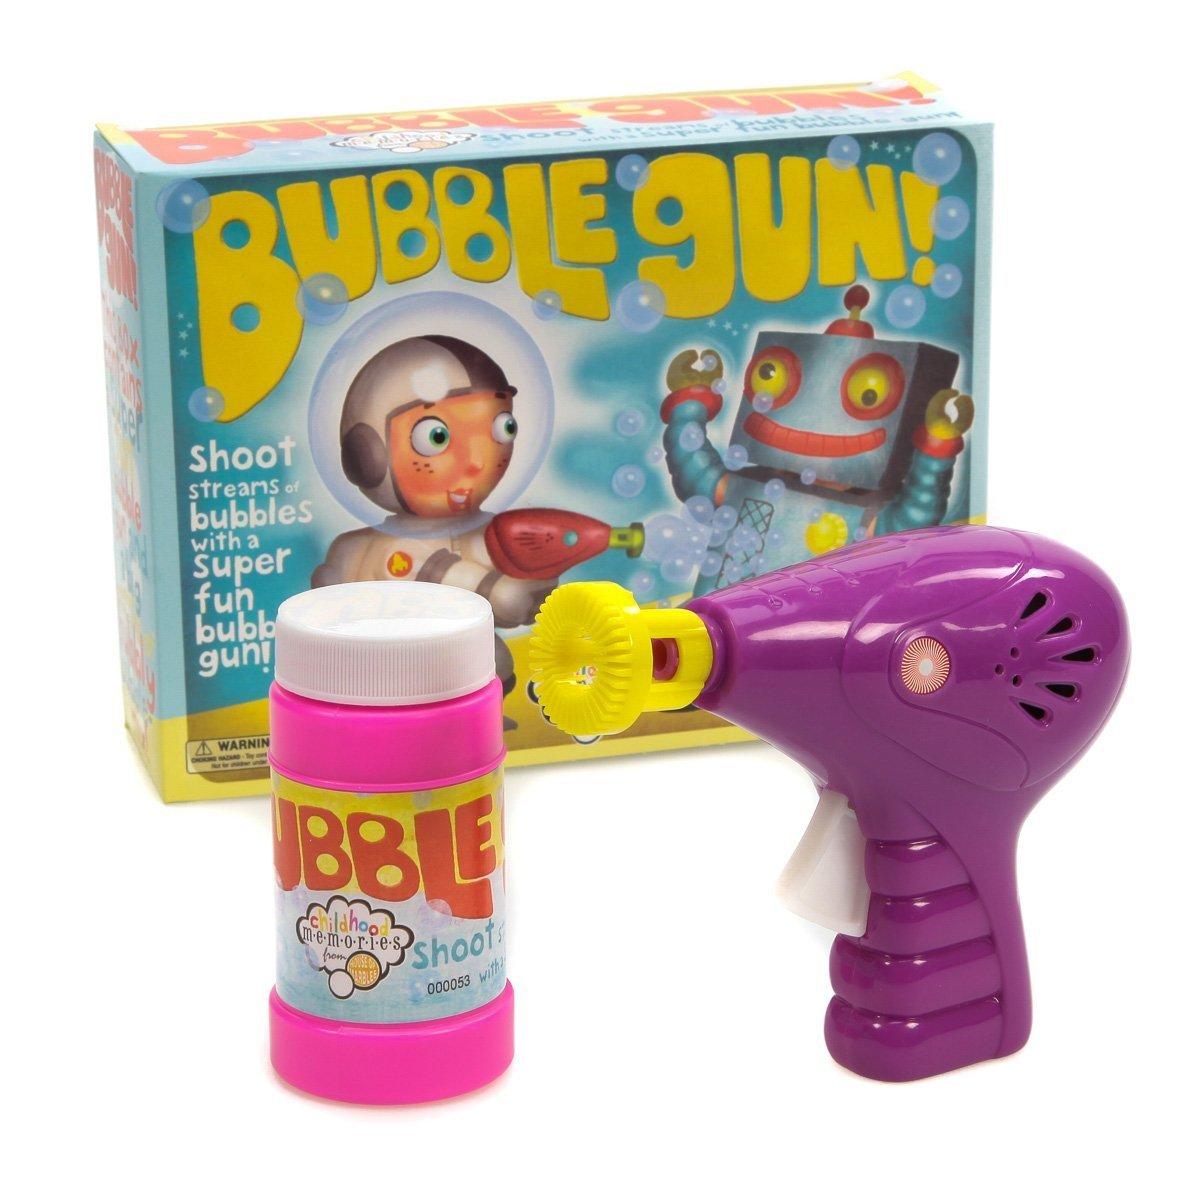 House of Marbles Retro Bubble Gun